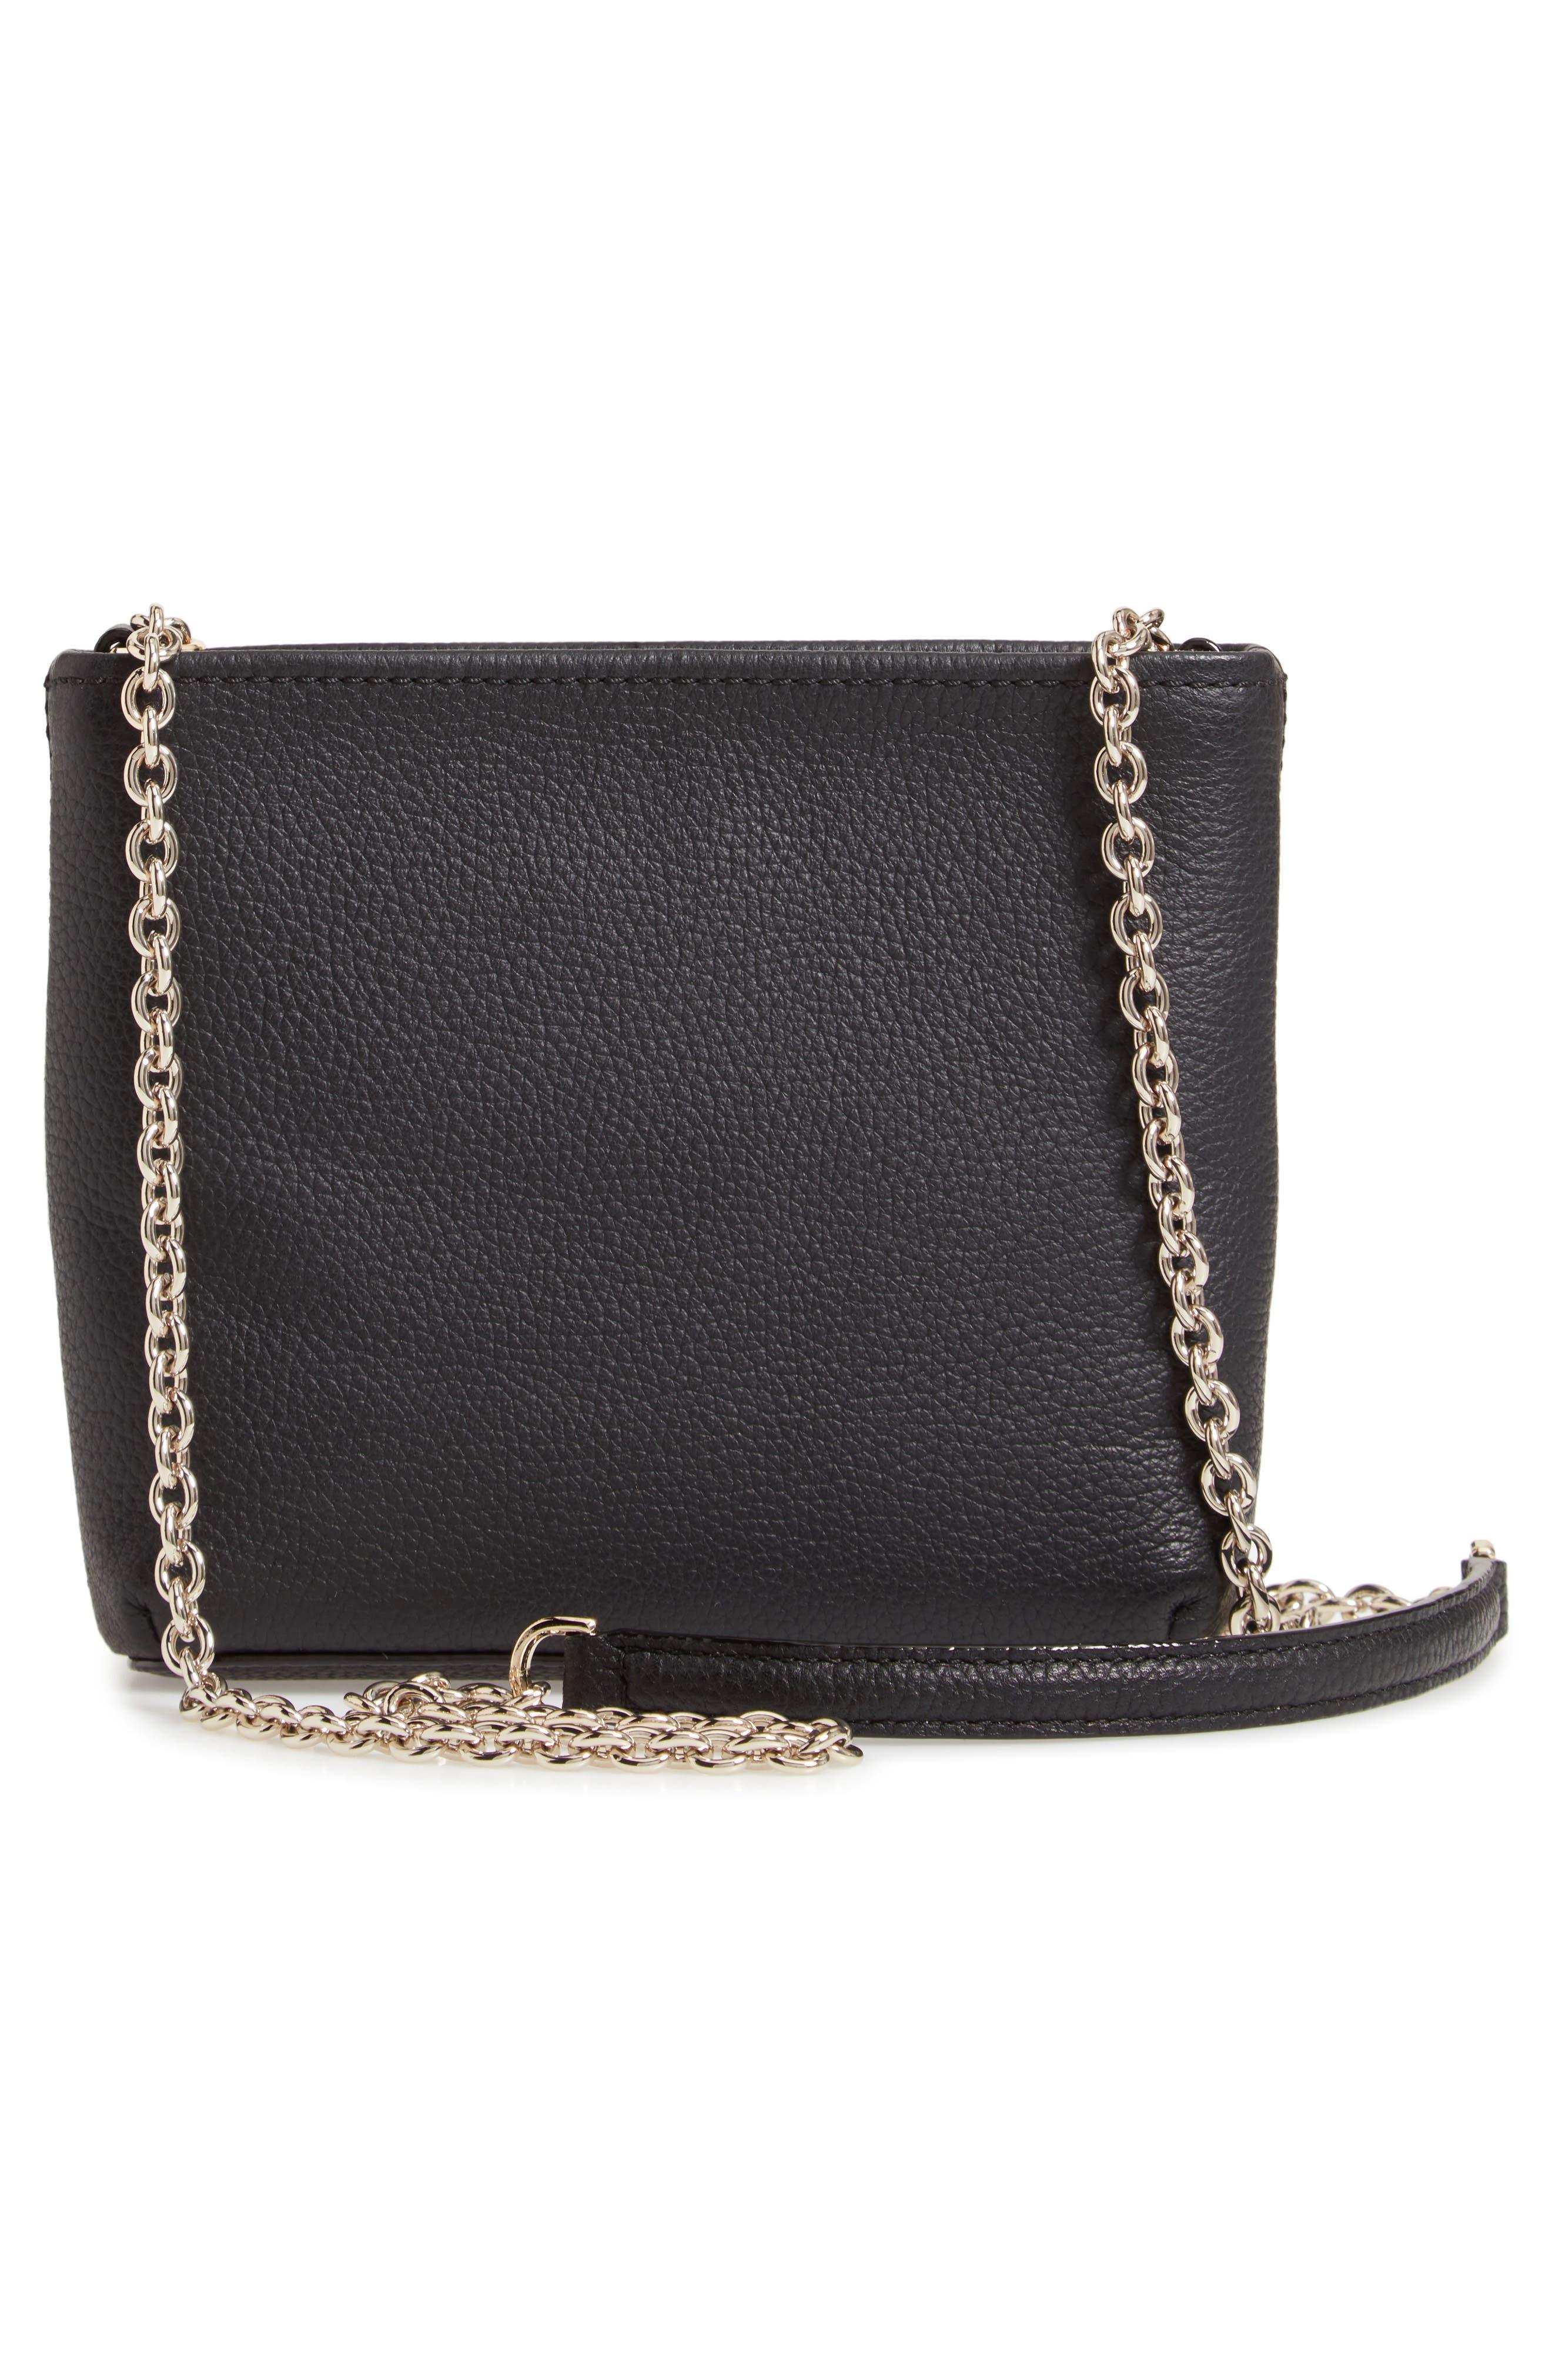 jackson street - ellery leather crossbody bag,                             Alternate thumbnail 3, color,                             BLACK